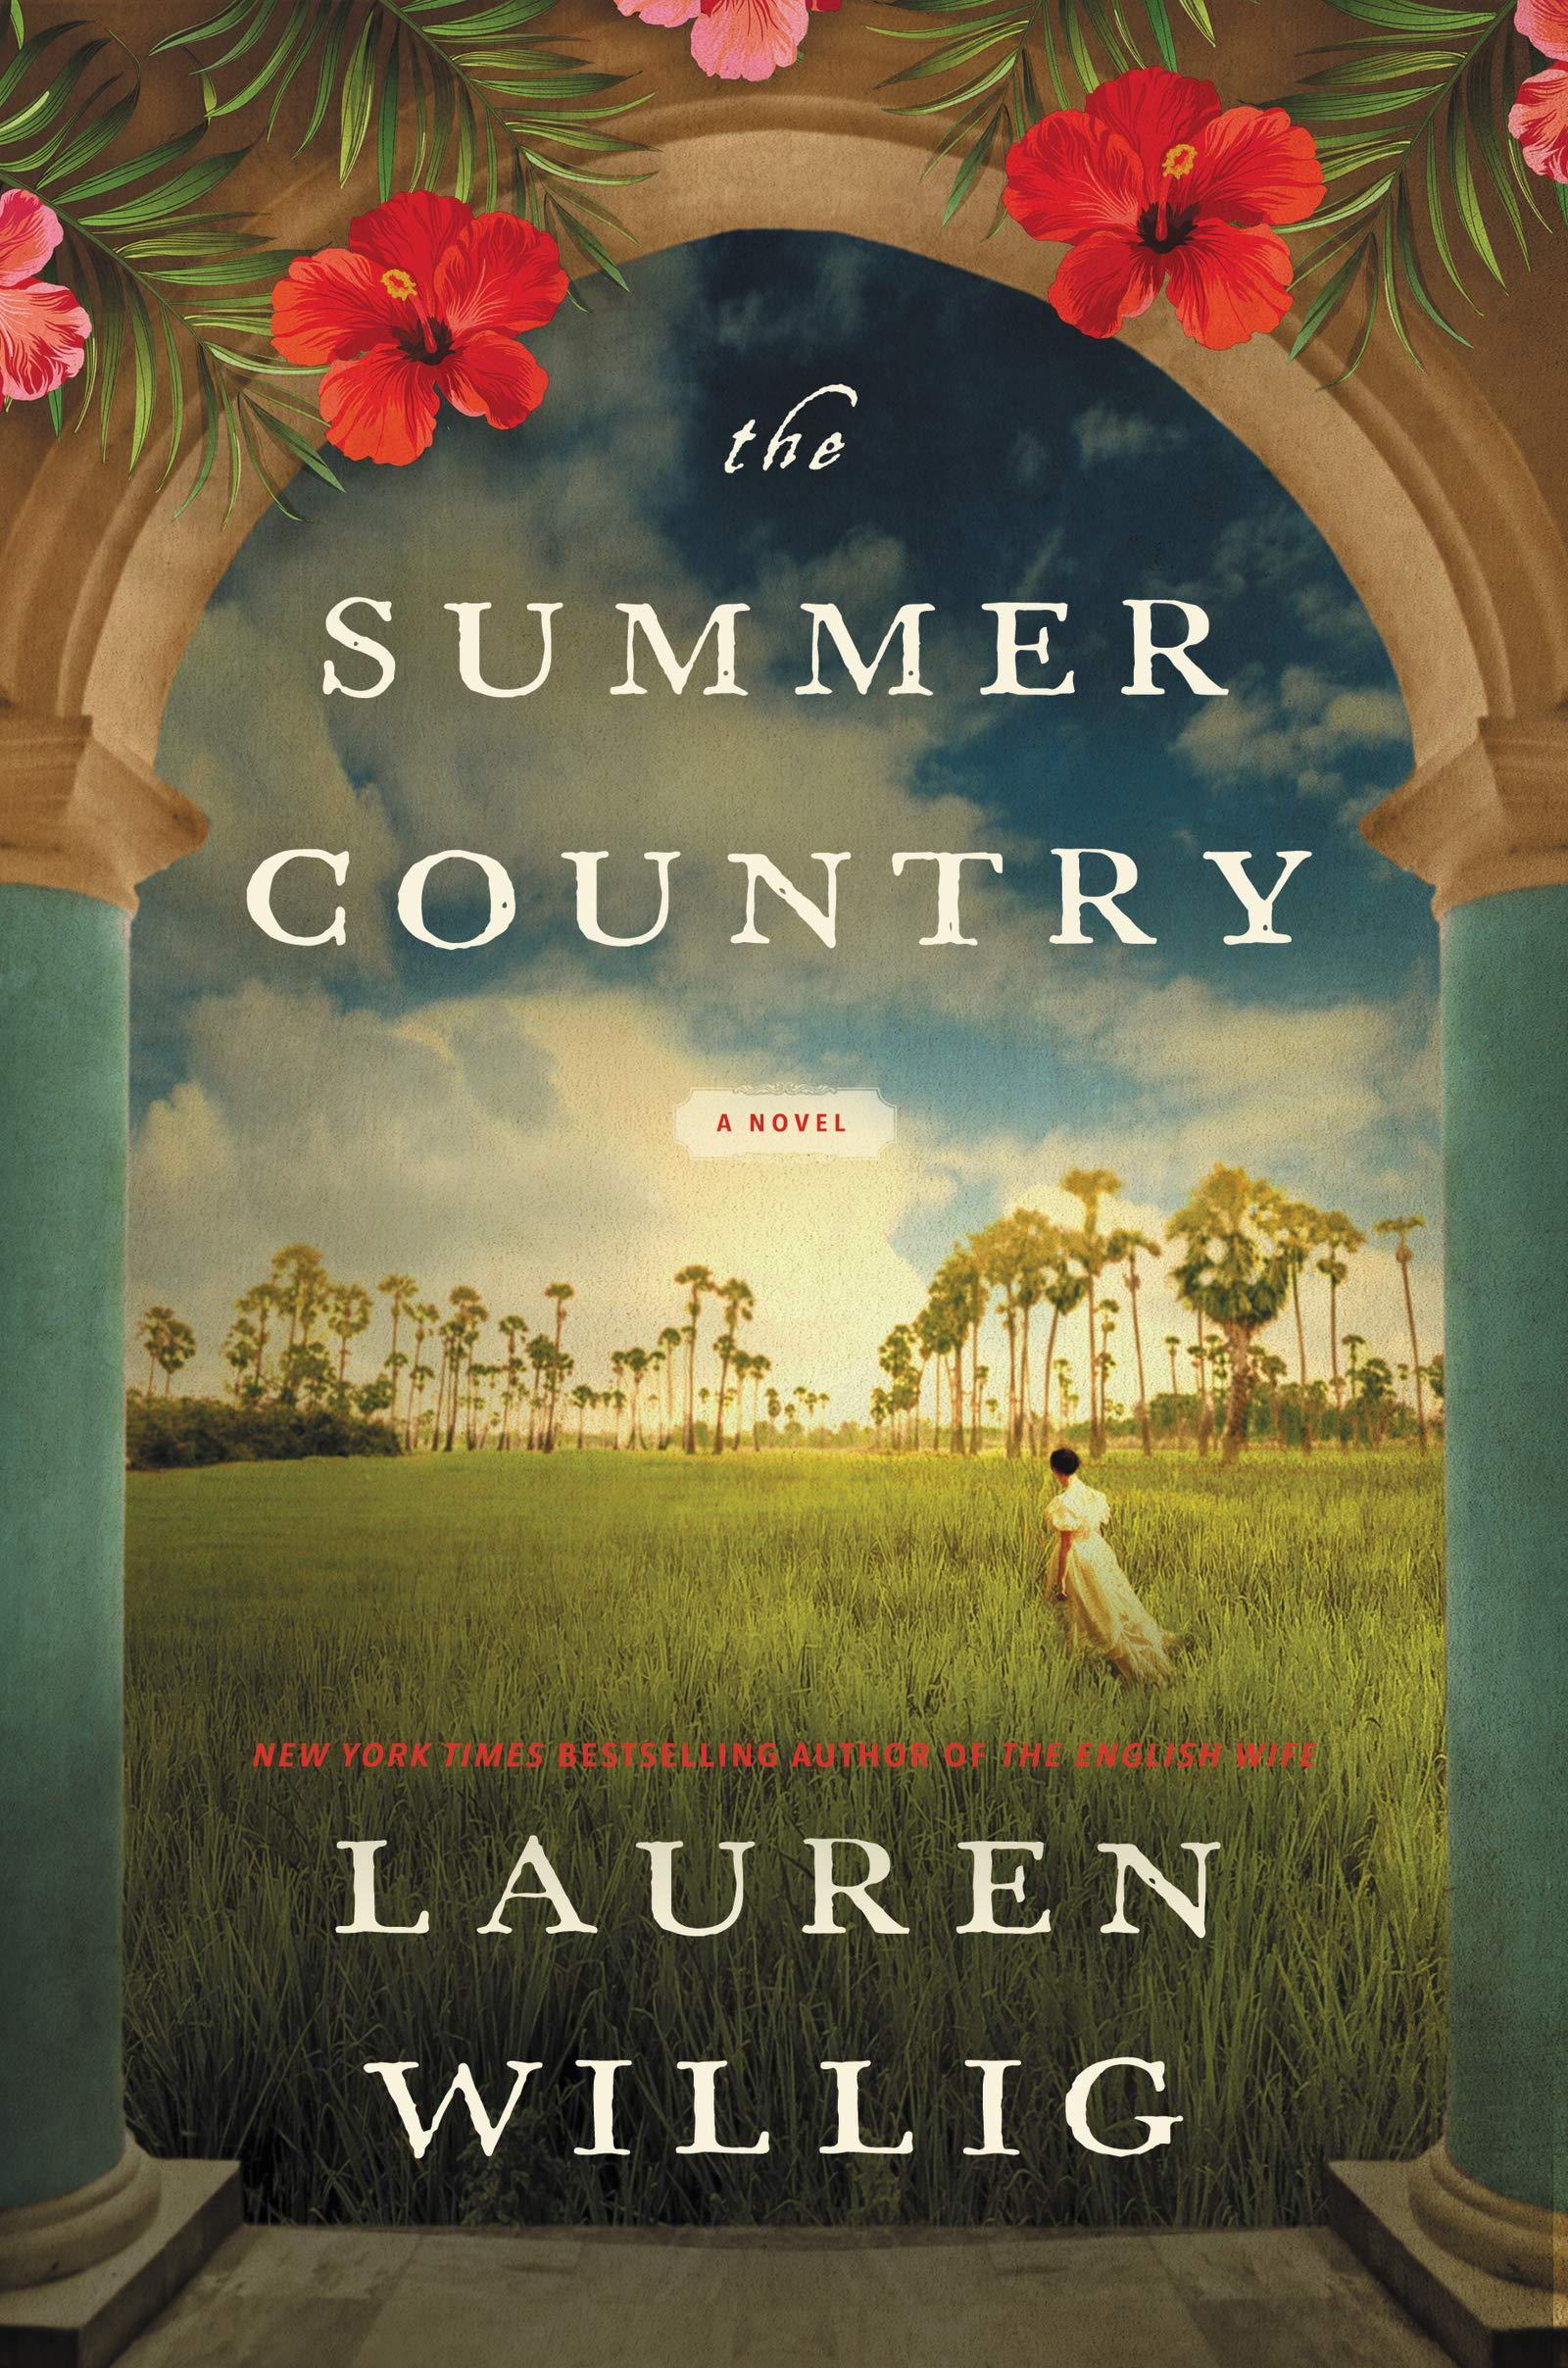 Author Interview - Stephanie Barron